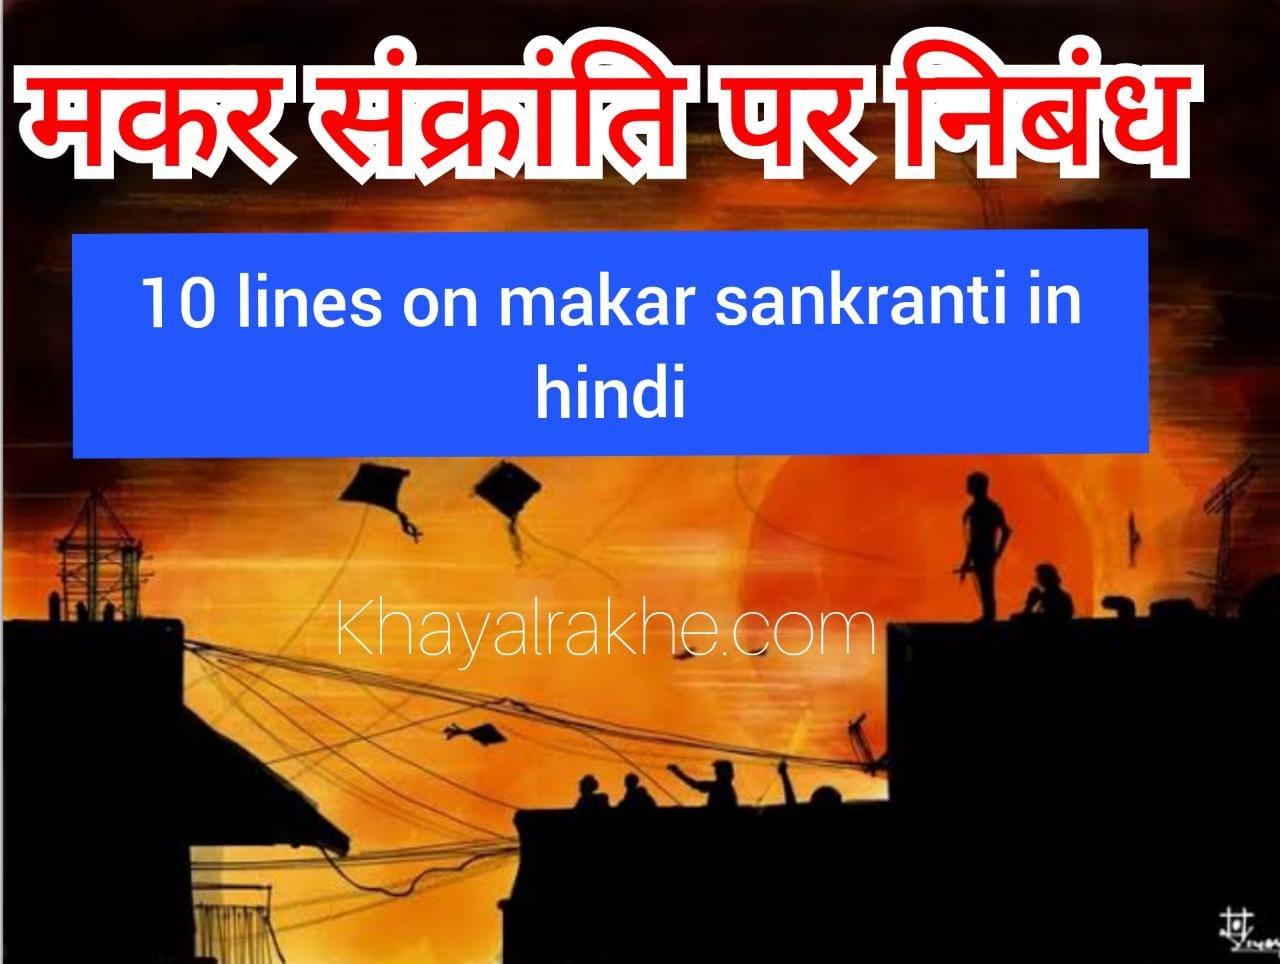 10 Lines on Makar Sankranti for Children In Hindi - Makar Sankranti Par 10 Lines